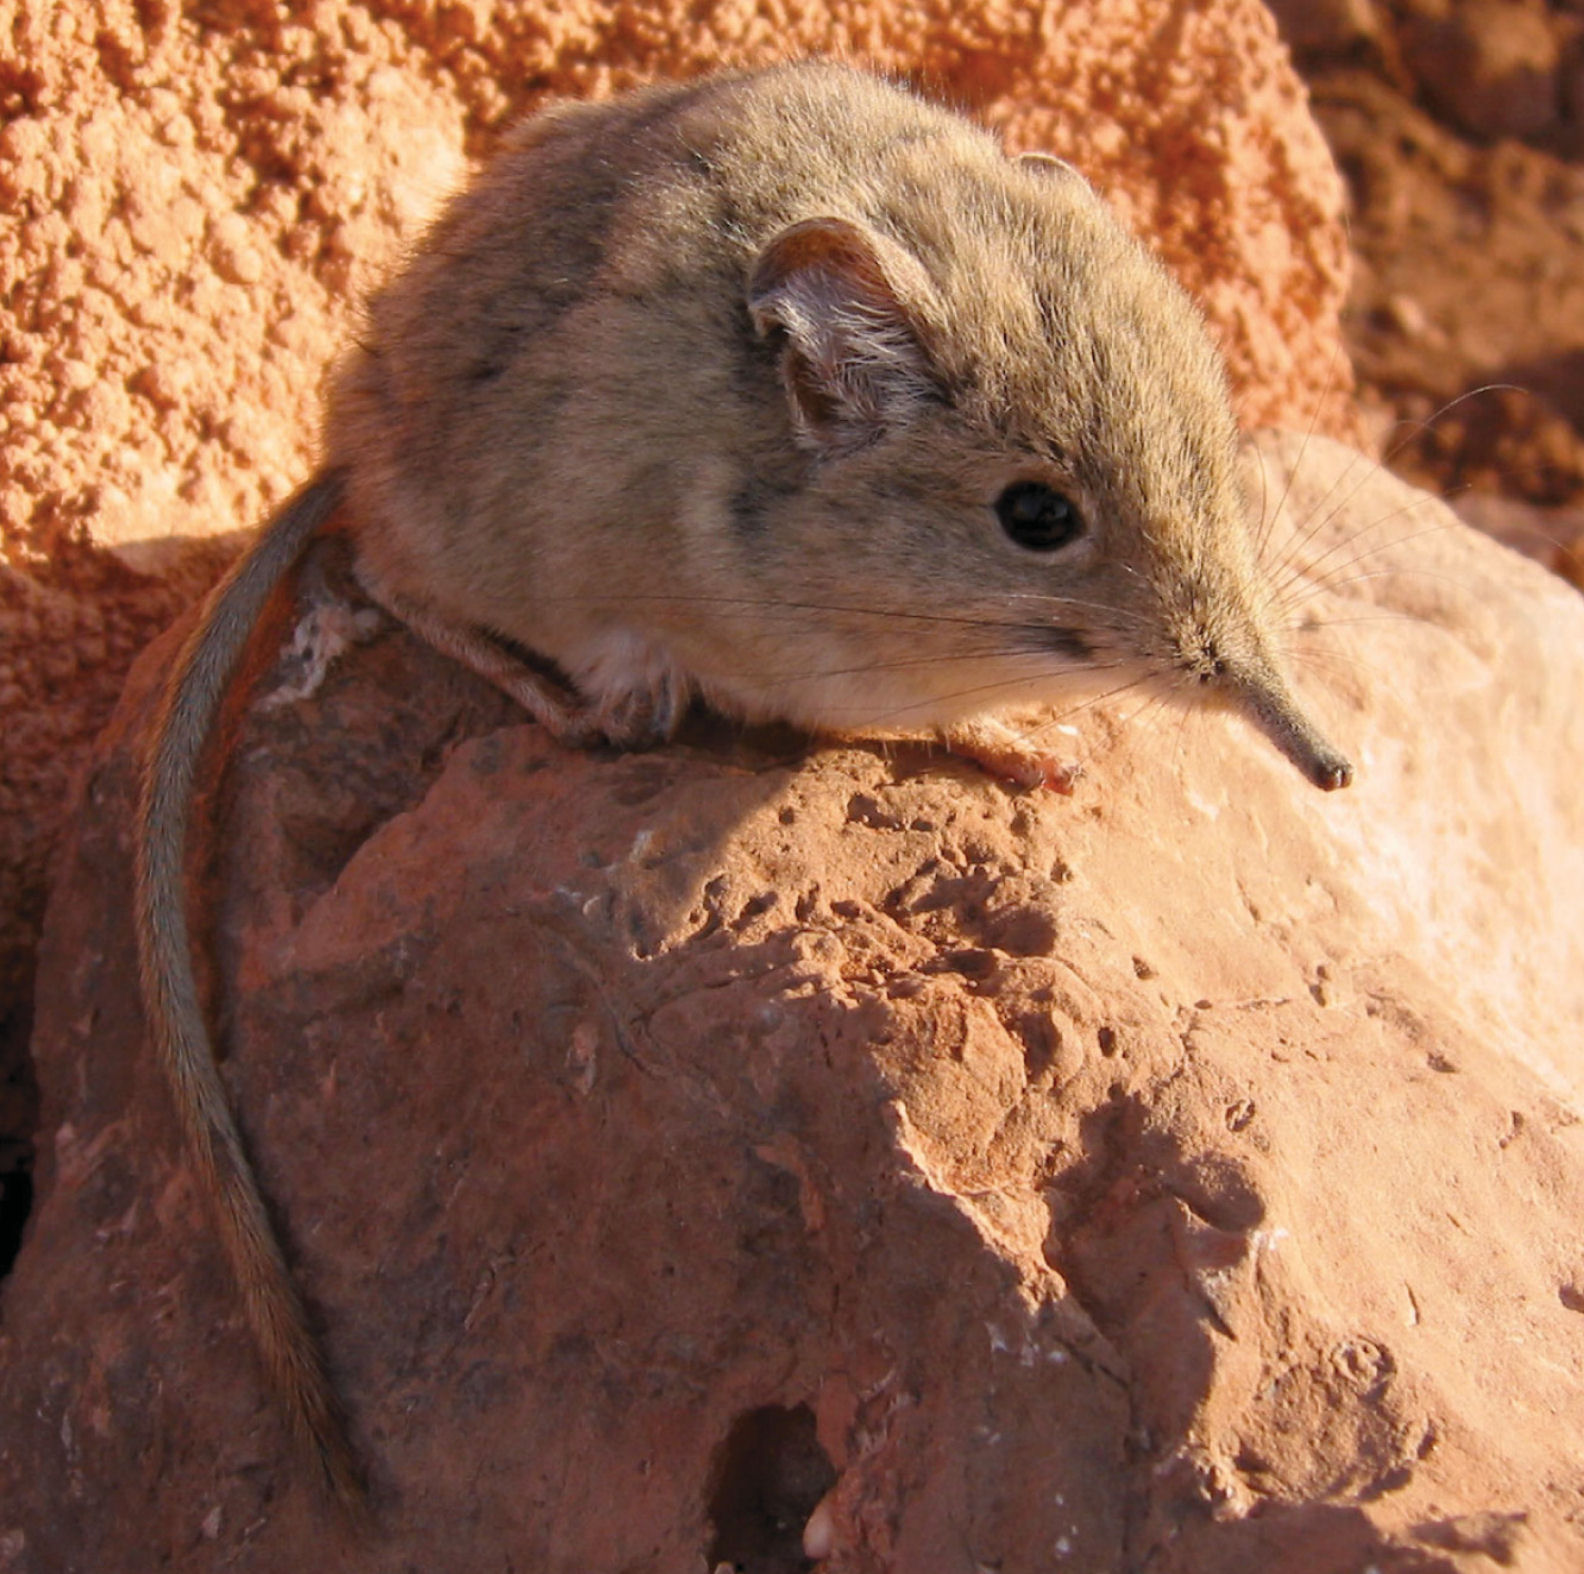 Petrosaltator_rozeti-Zootaxa.jpg